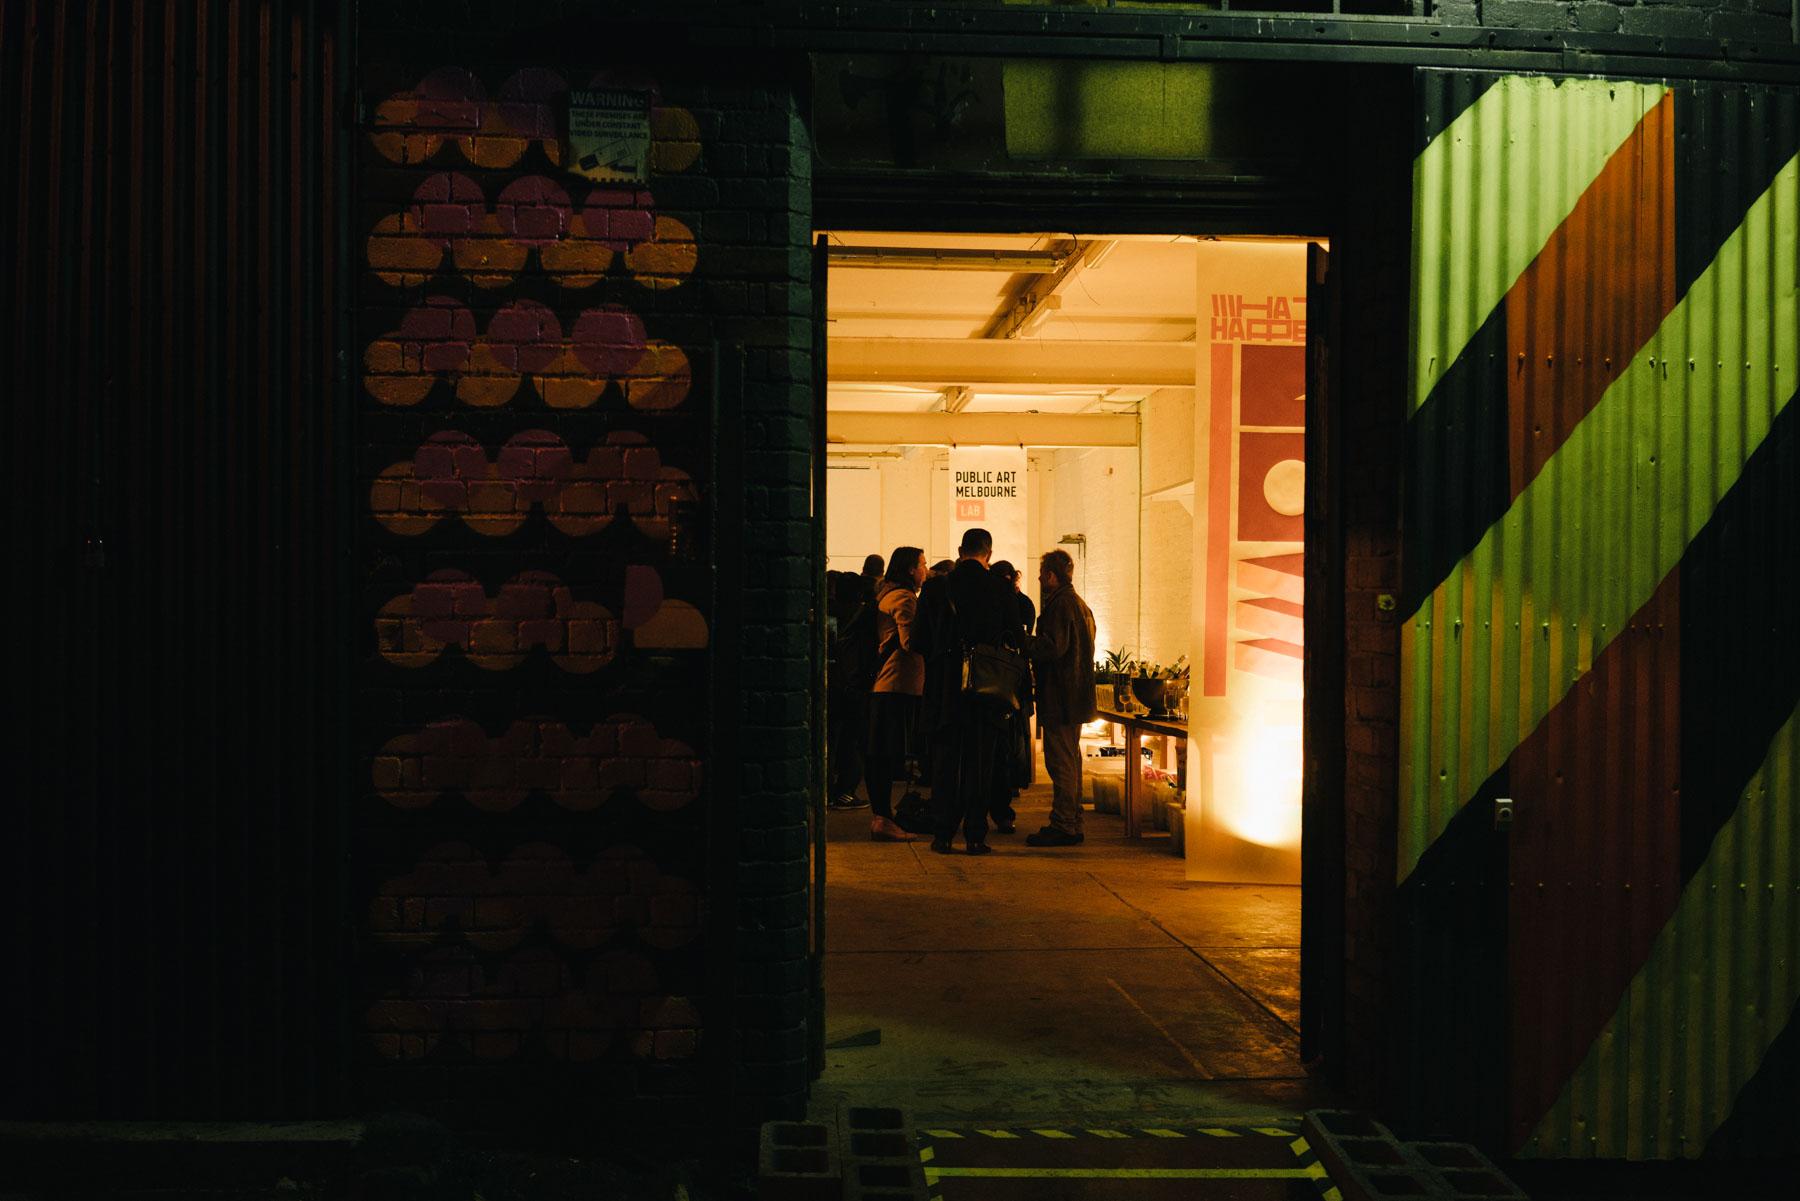 Biennial Lab entrance at night. Photo: Kristoffer Paulsen.